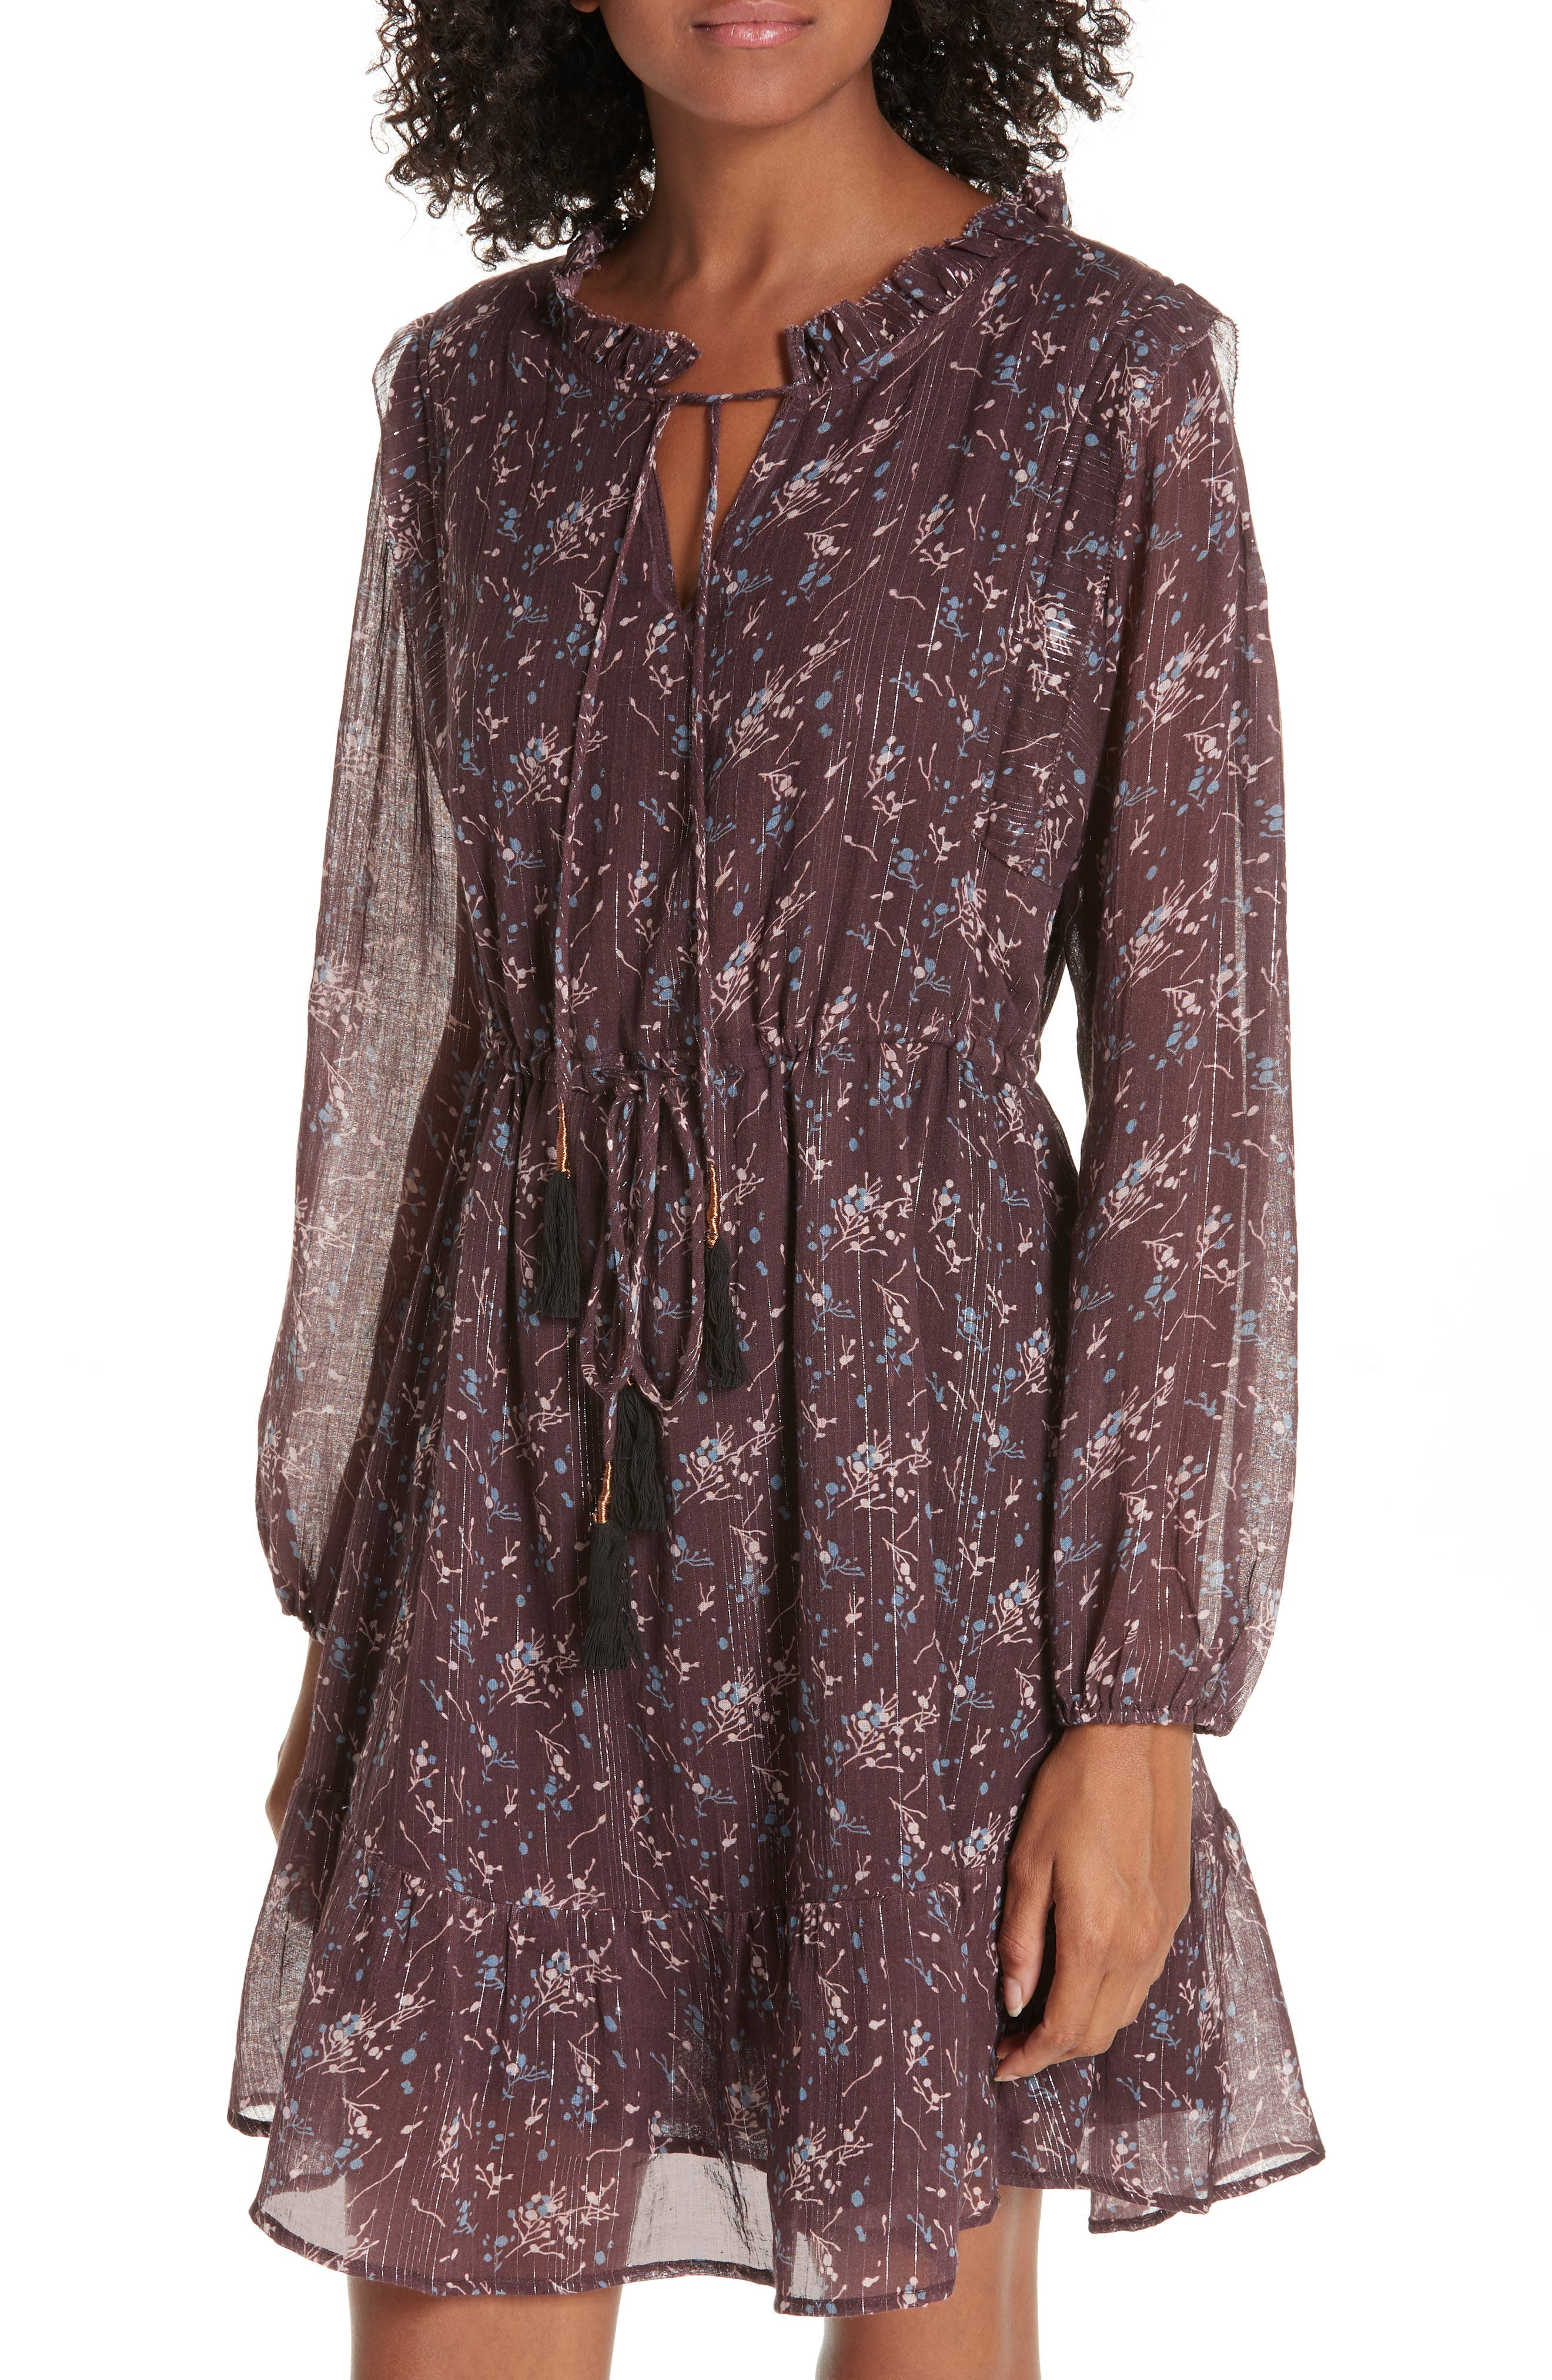 Ruffled Drawstring Waist Dress,                             Alternate thumbnail 4, color,                             BROWN PLUM BLOSSOM